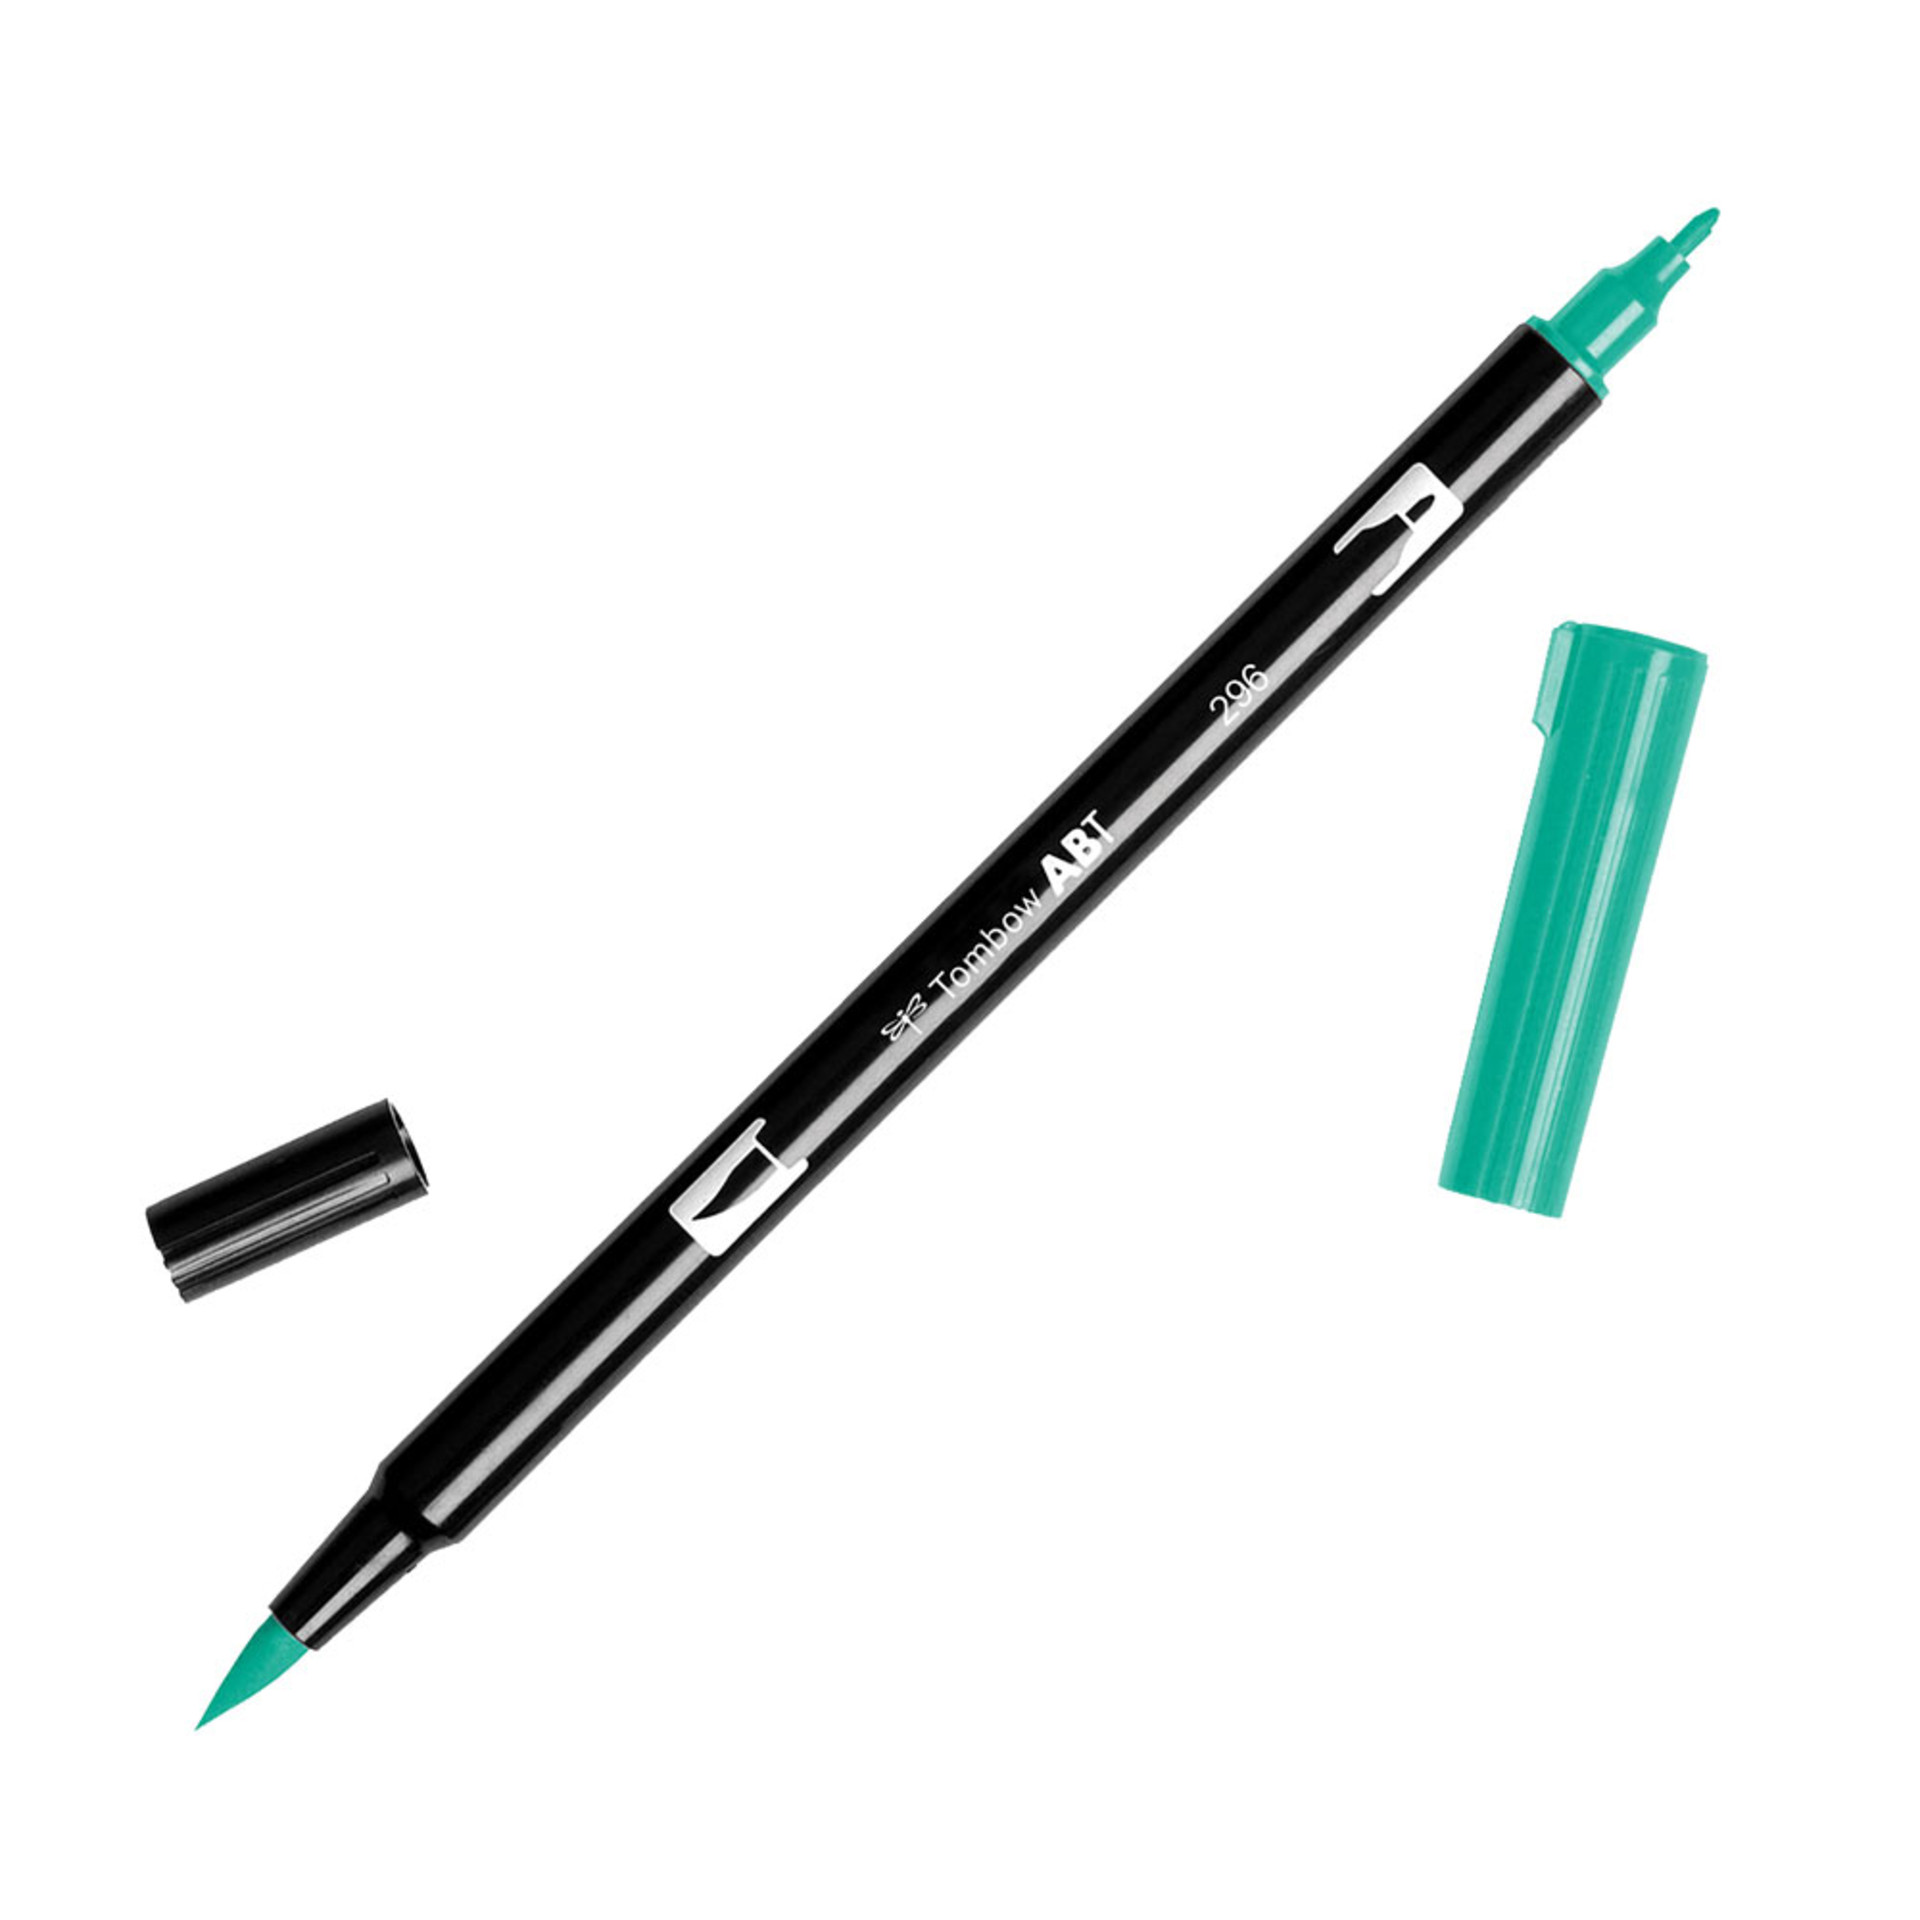 Tombow Dual-Tip Brush Marker Pen – Green